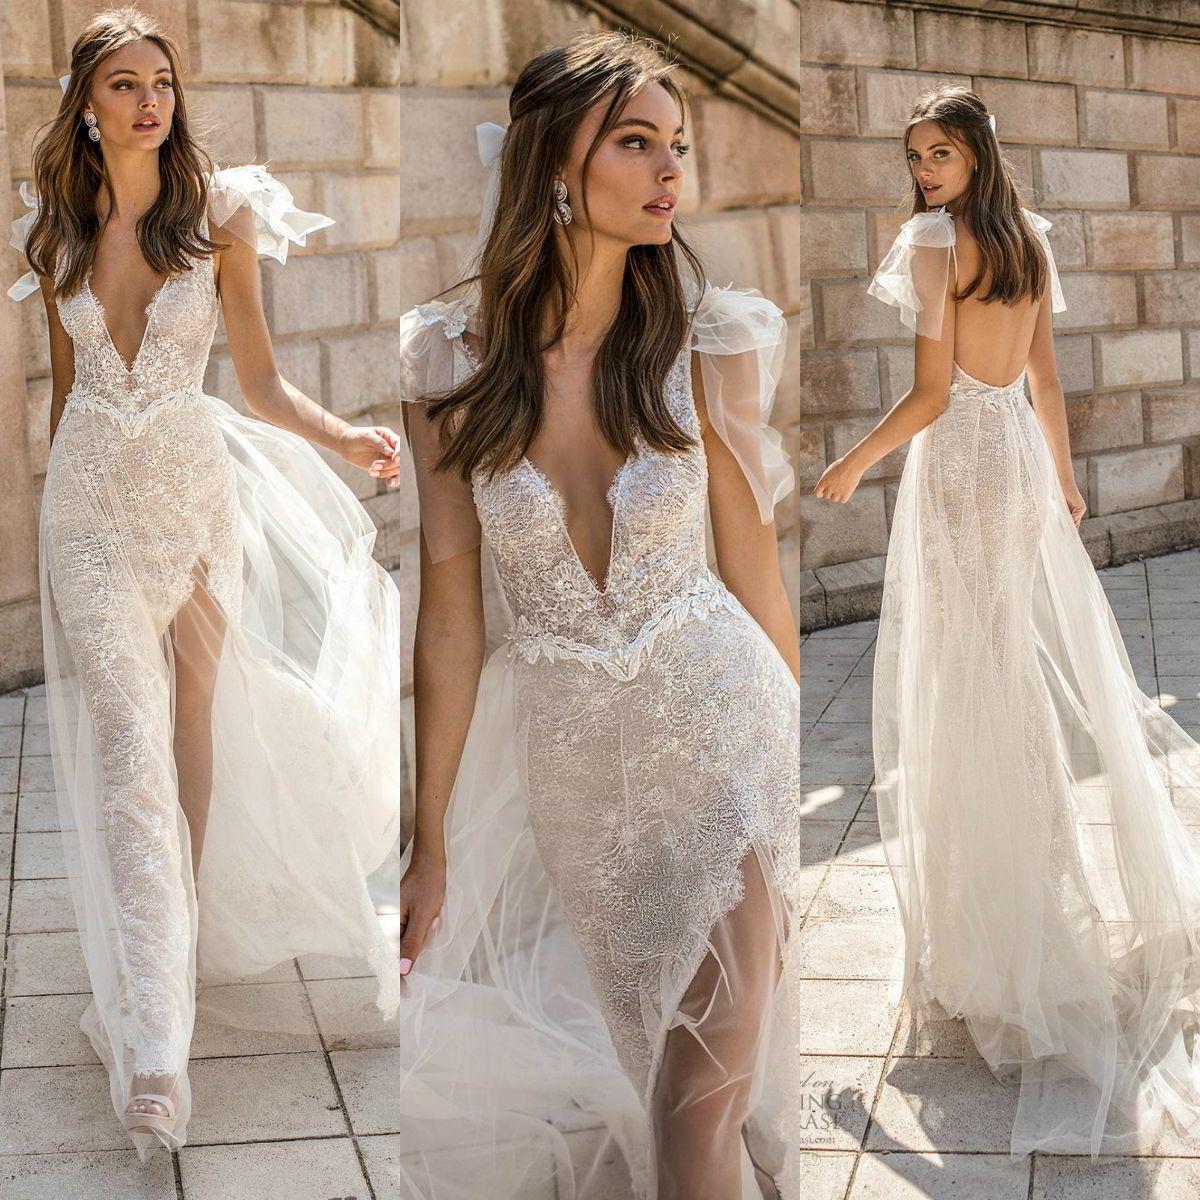 Muse By Berta 2019 Wedding Dresses V Neck Lace Sequins Split Backless Sweep Train Bridal Gowns Plus Size Boho Robe De Mariée